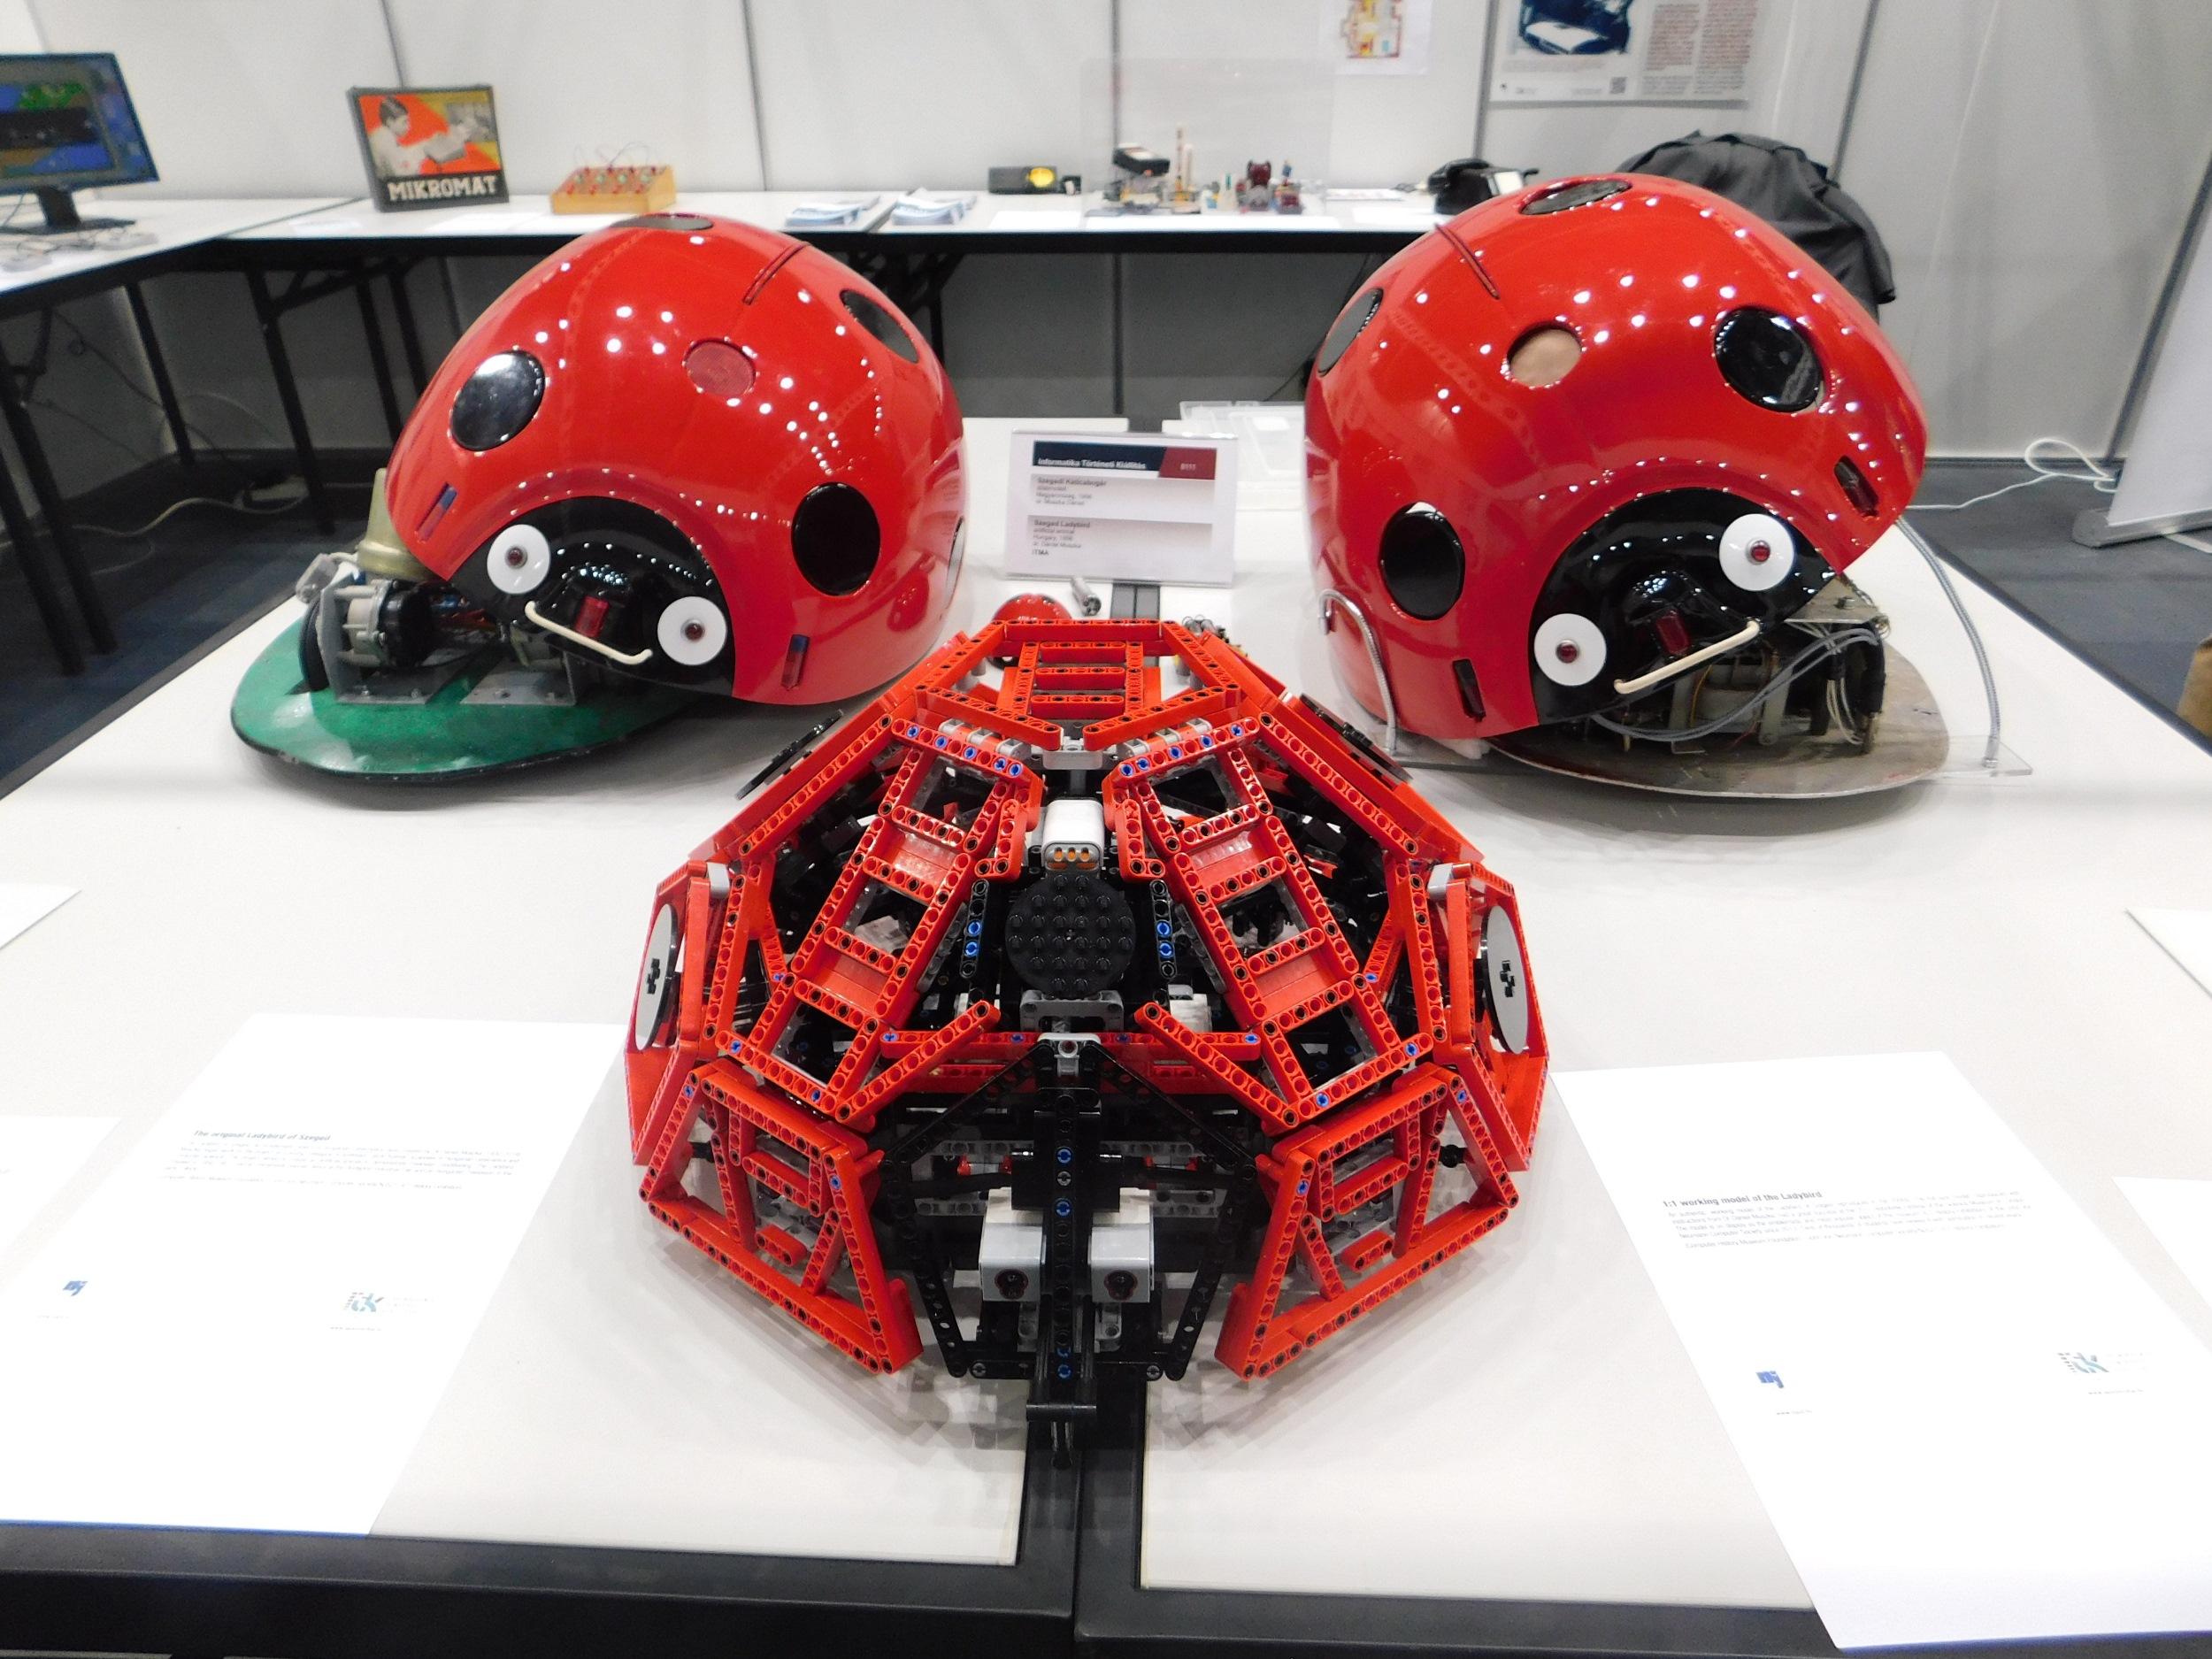 A magyar robotkatica is részt vett a World Robot Olympiadon